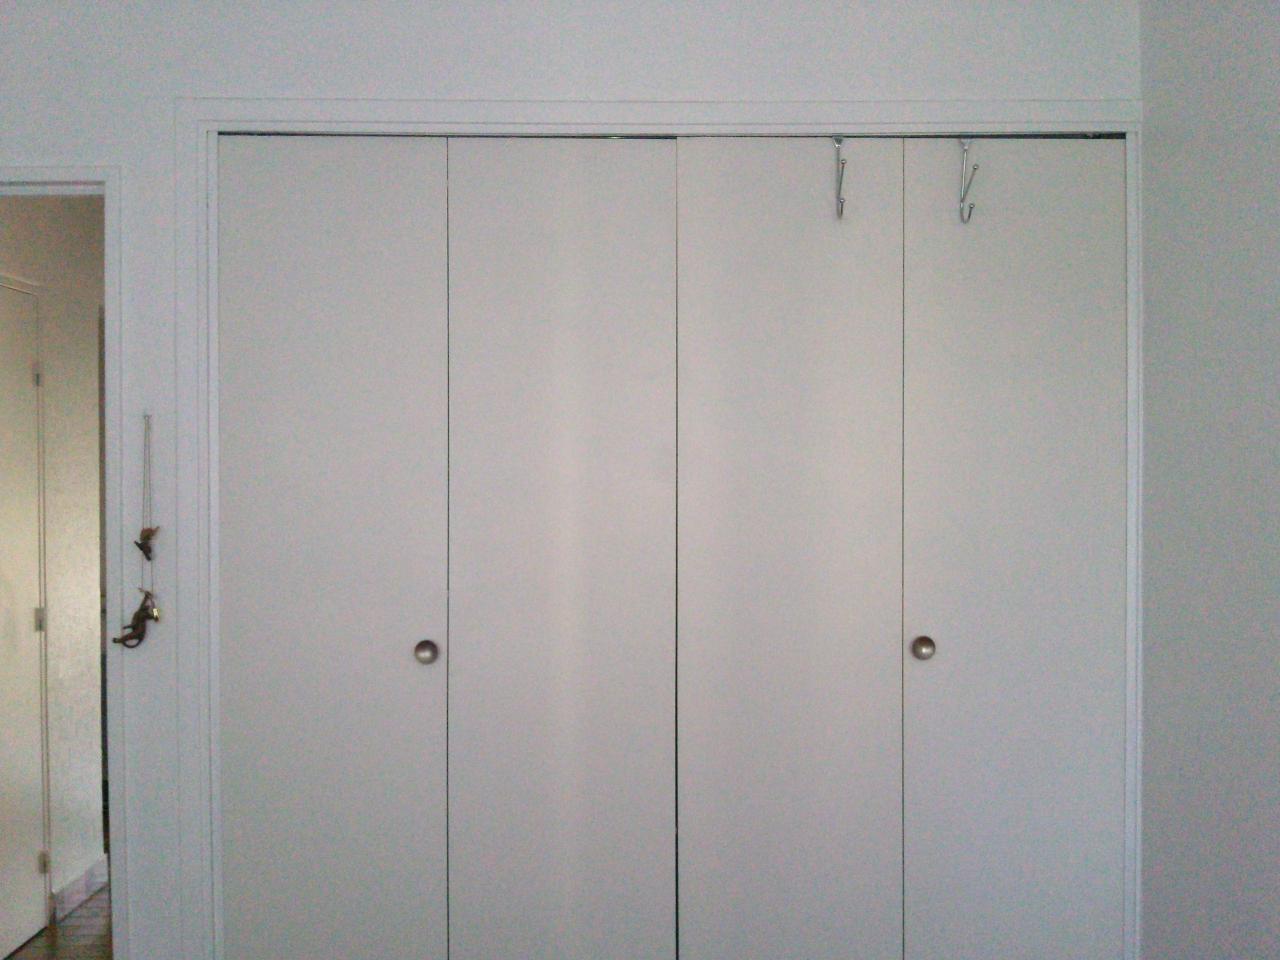 Problme Portes Pliantesaccordon De Placardarmoire